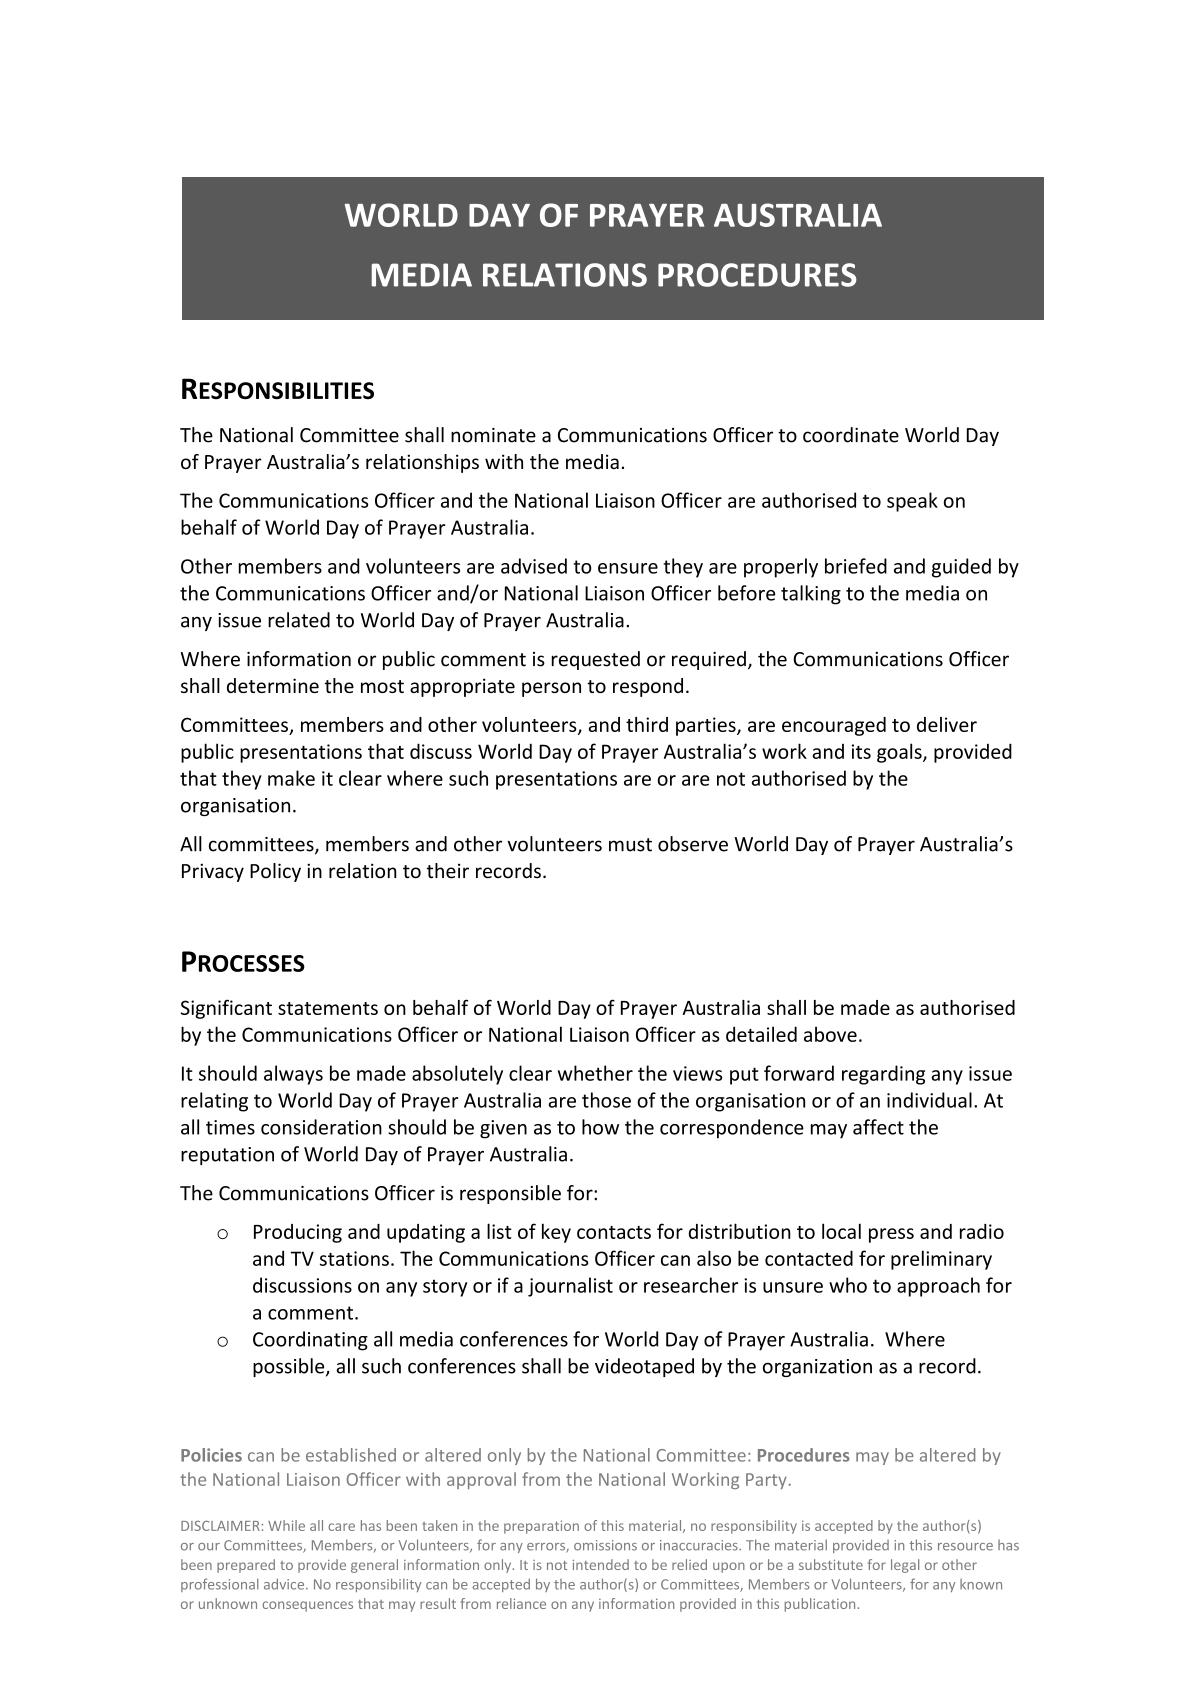 Media Relations Policies and Procedures